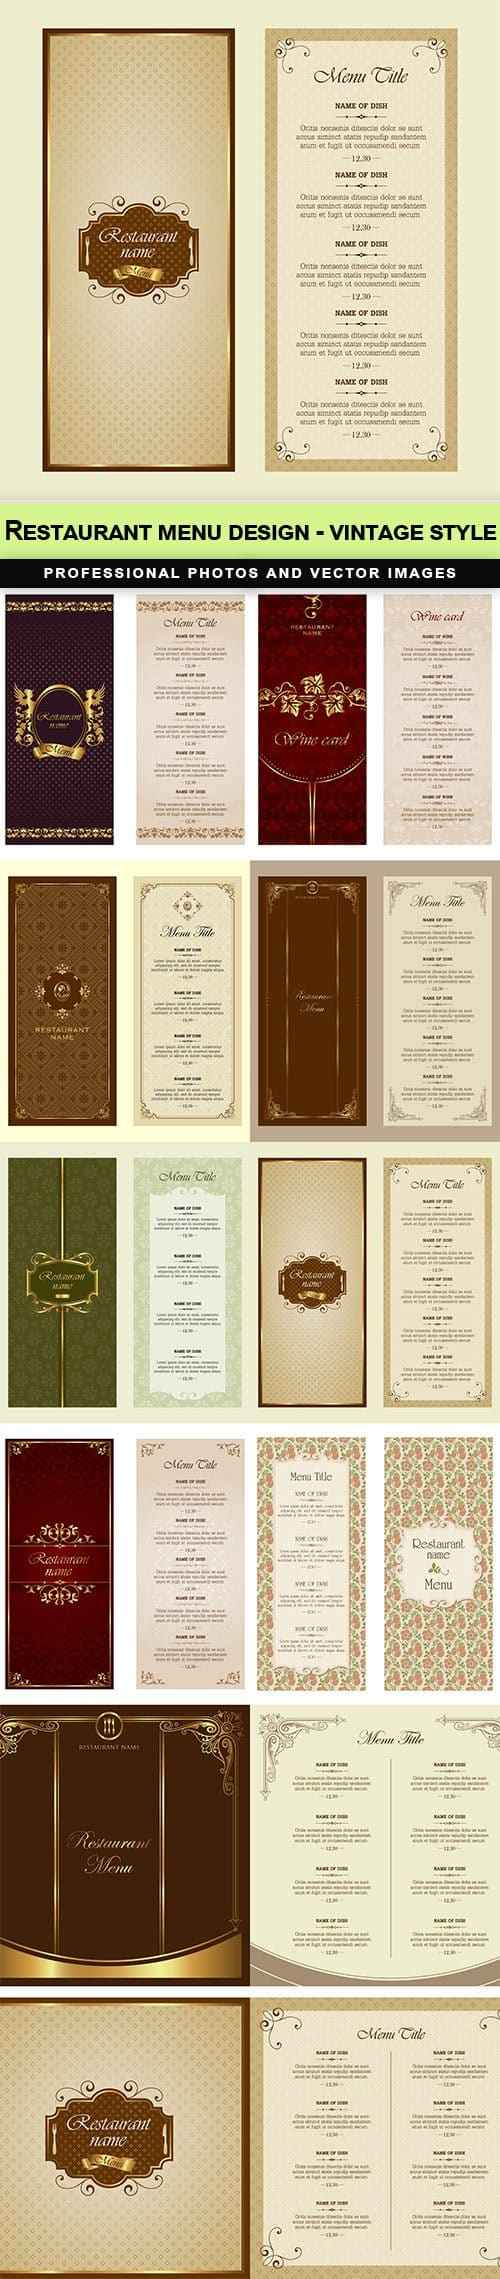 Restaurant menu design – vintage style – 9 EPS